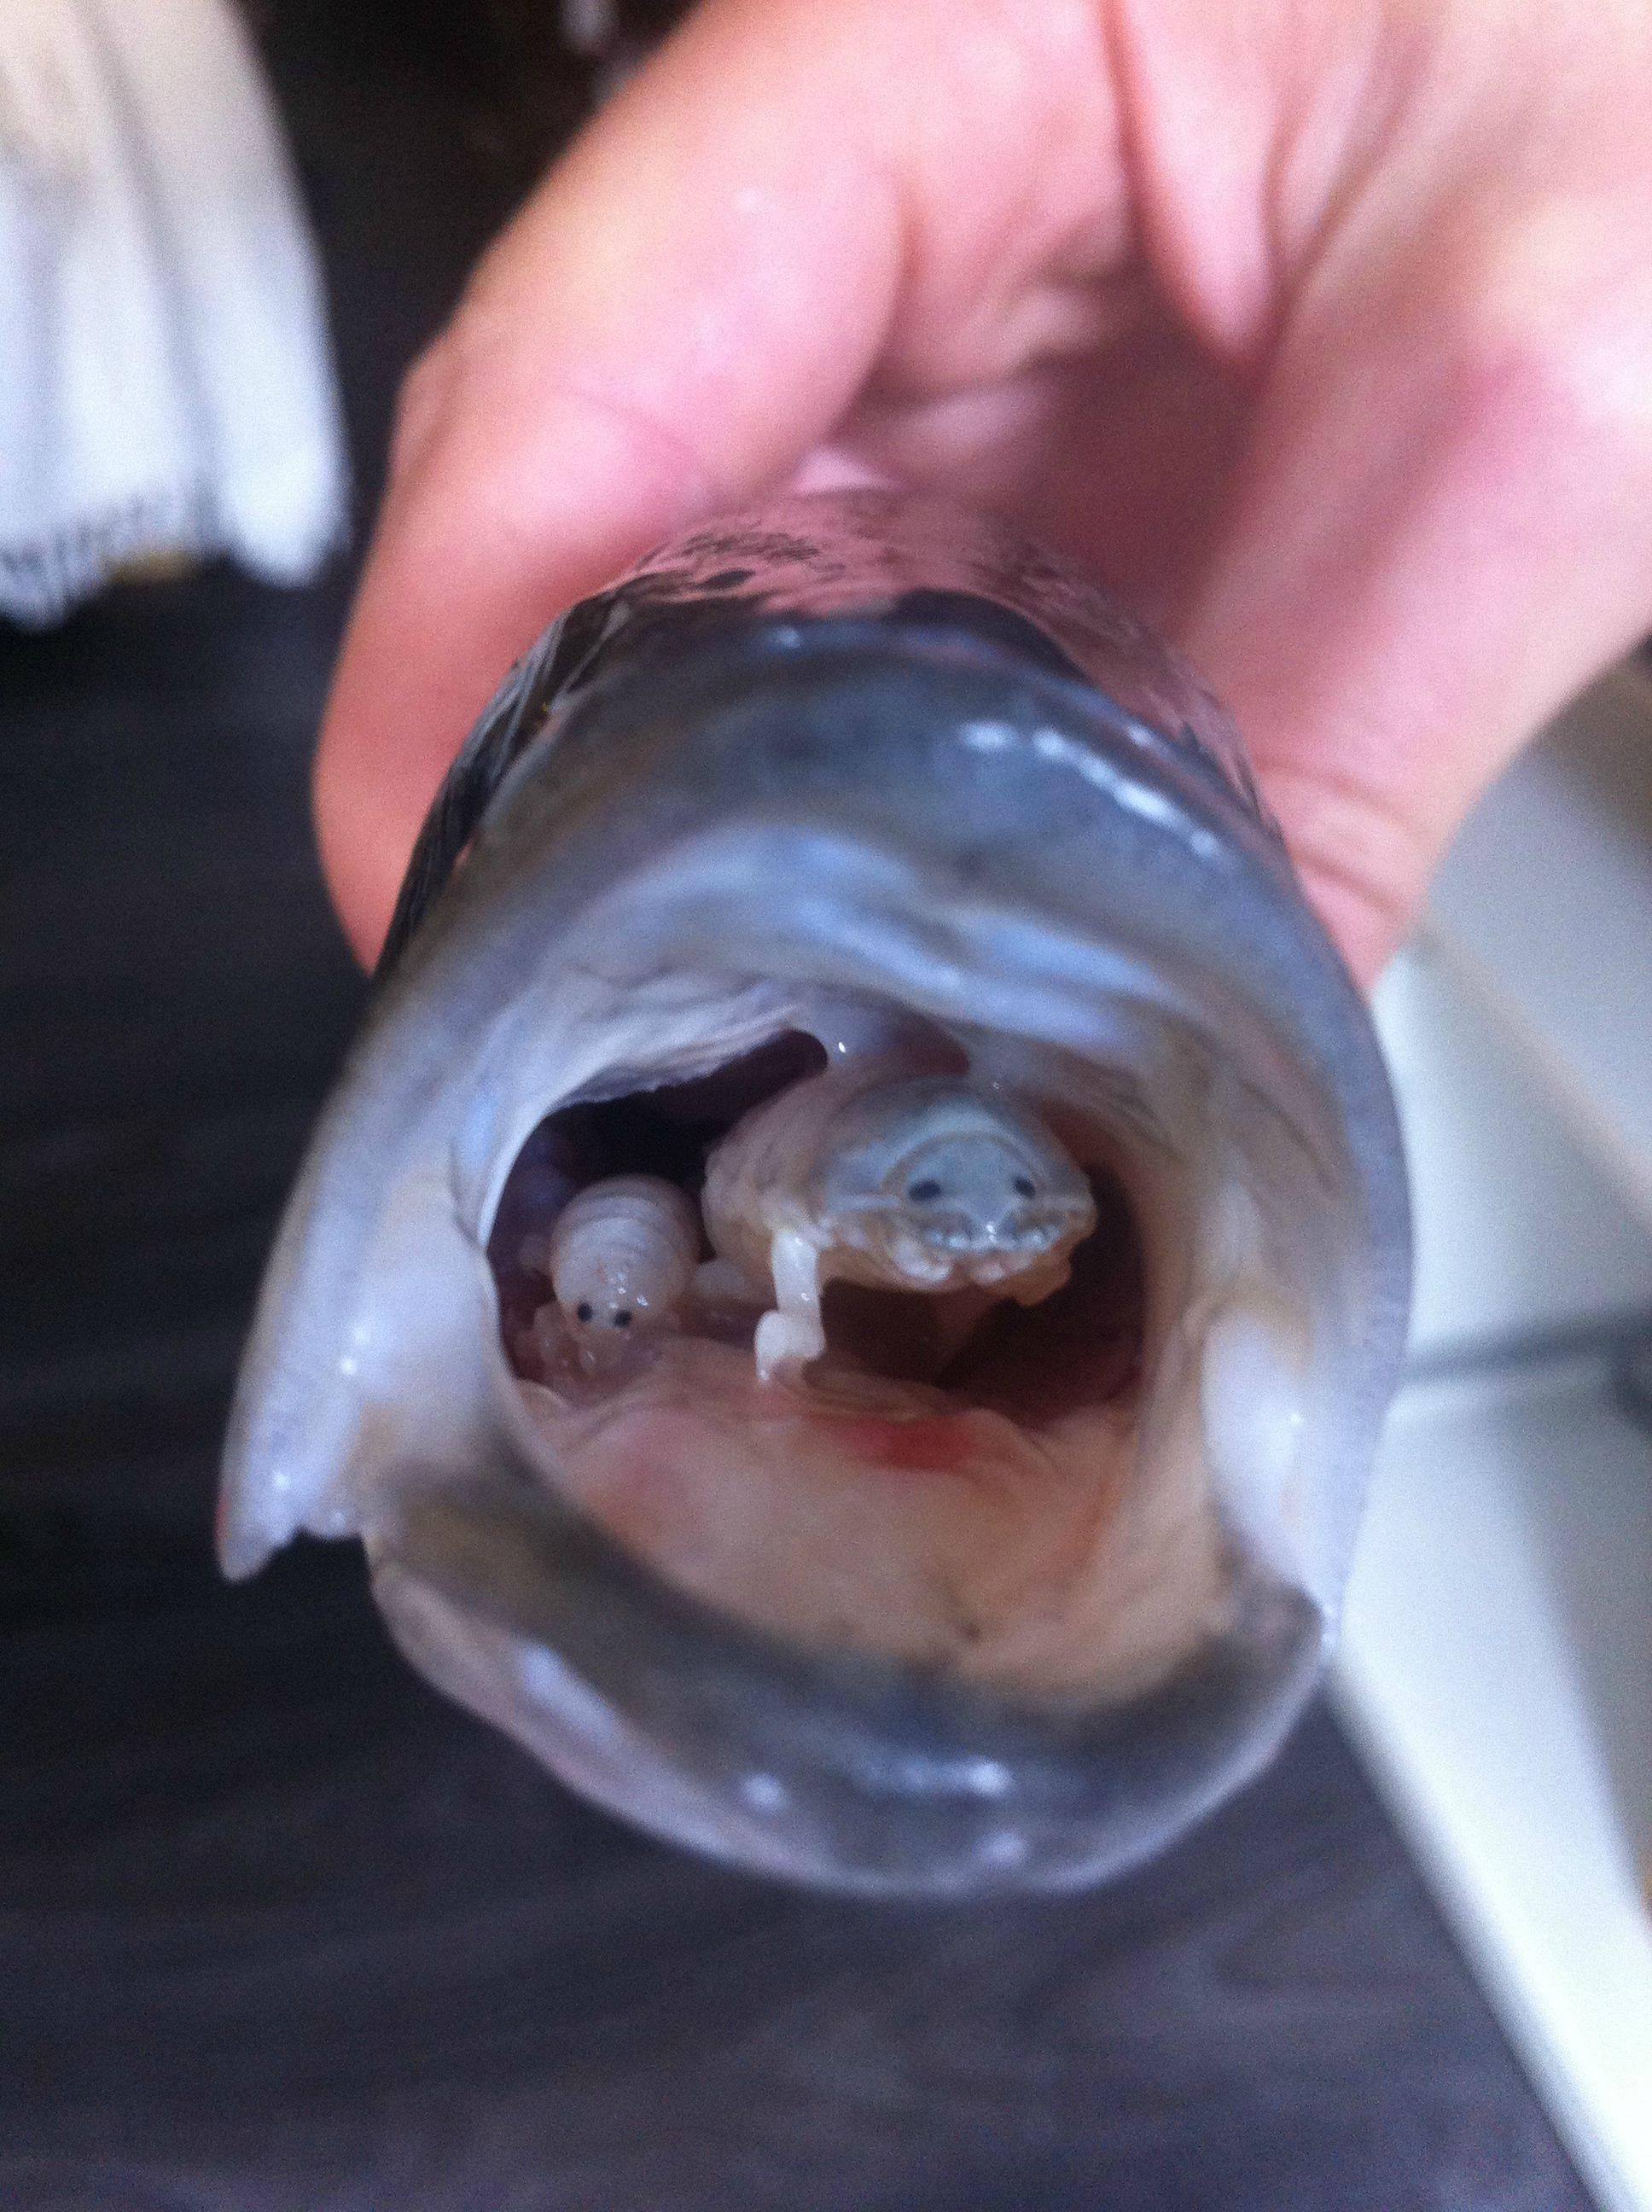 Penis fish parasite